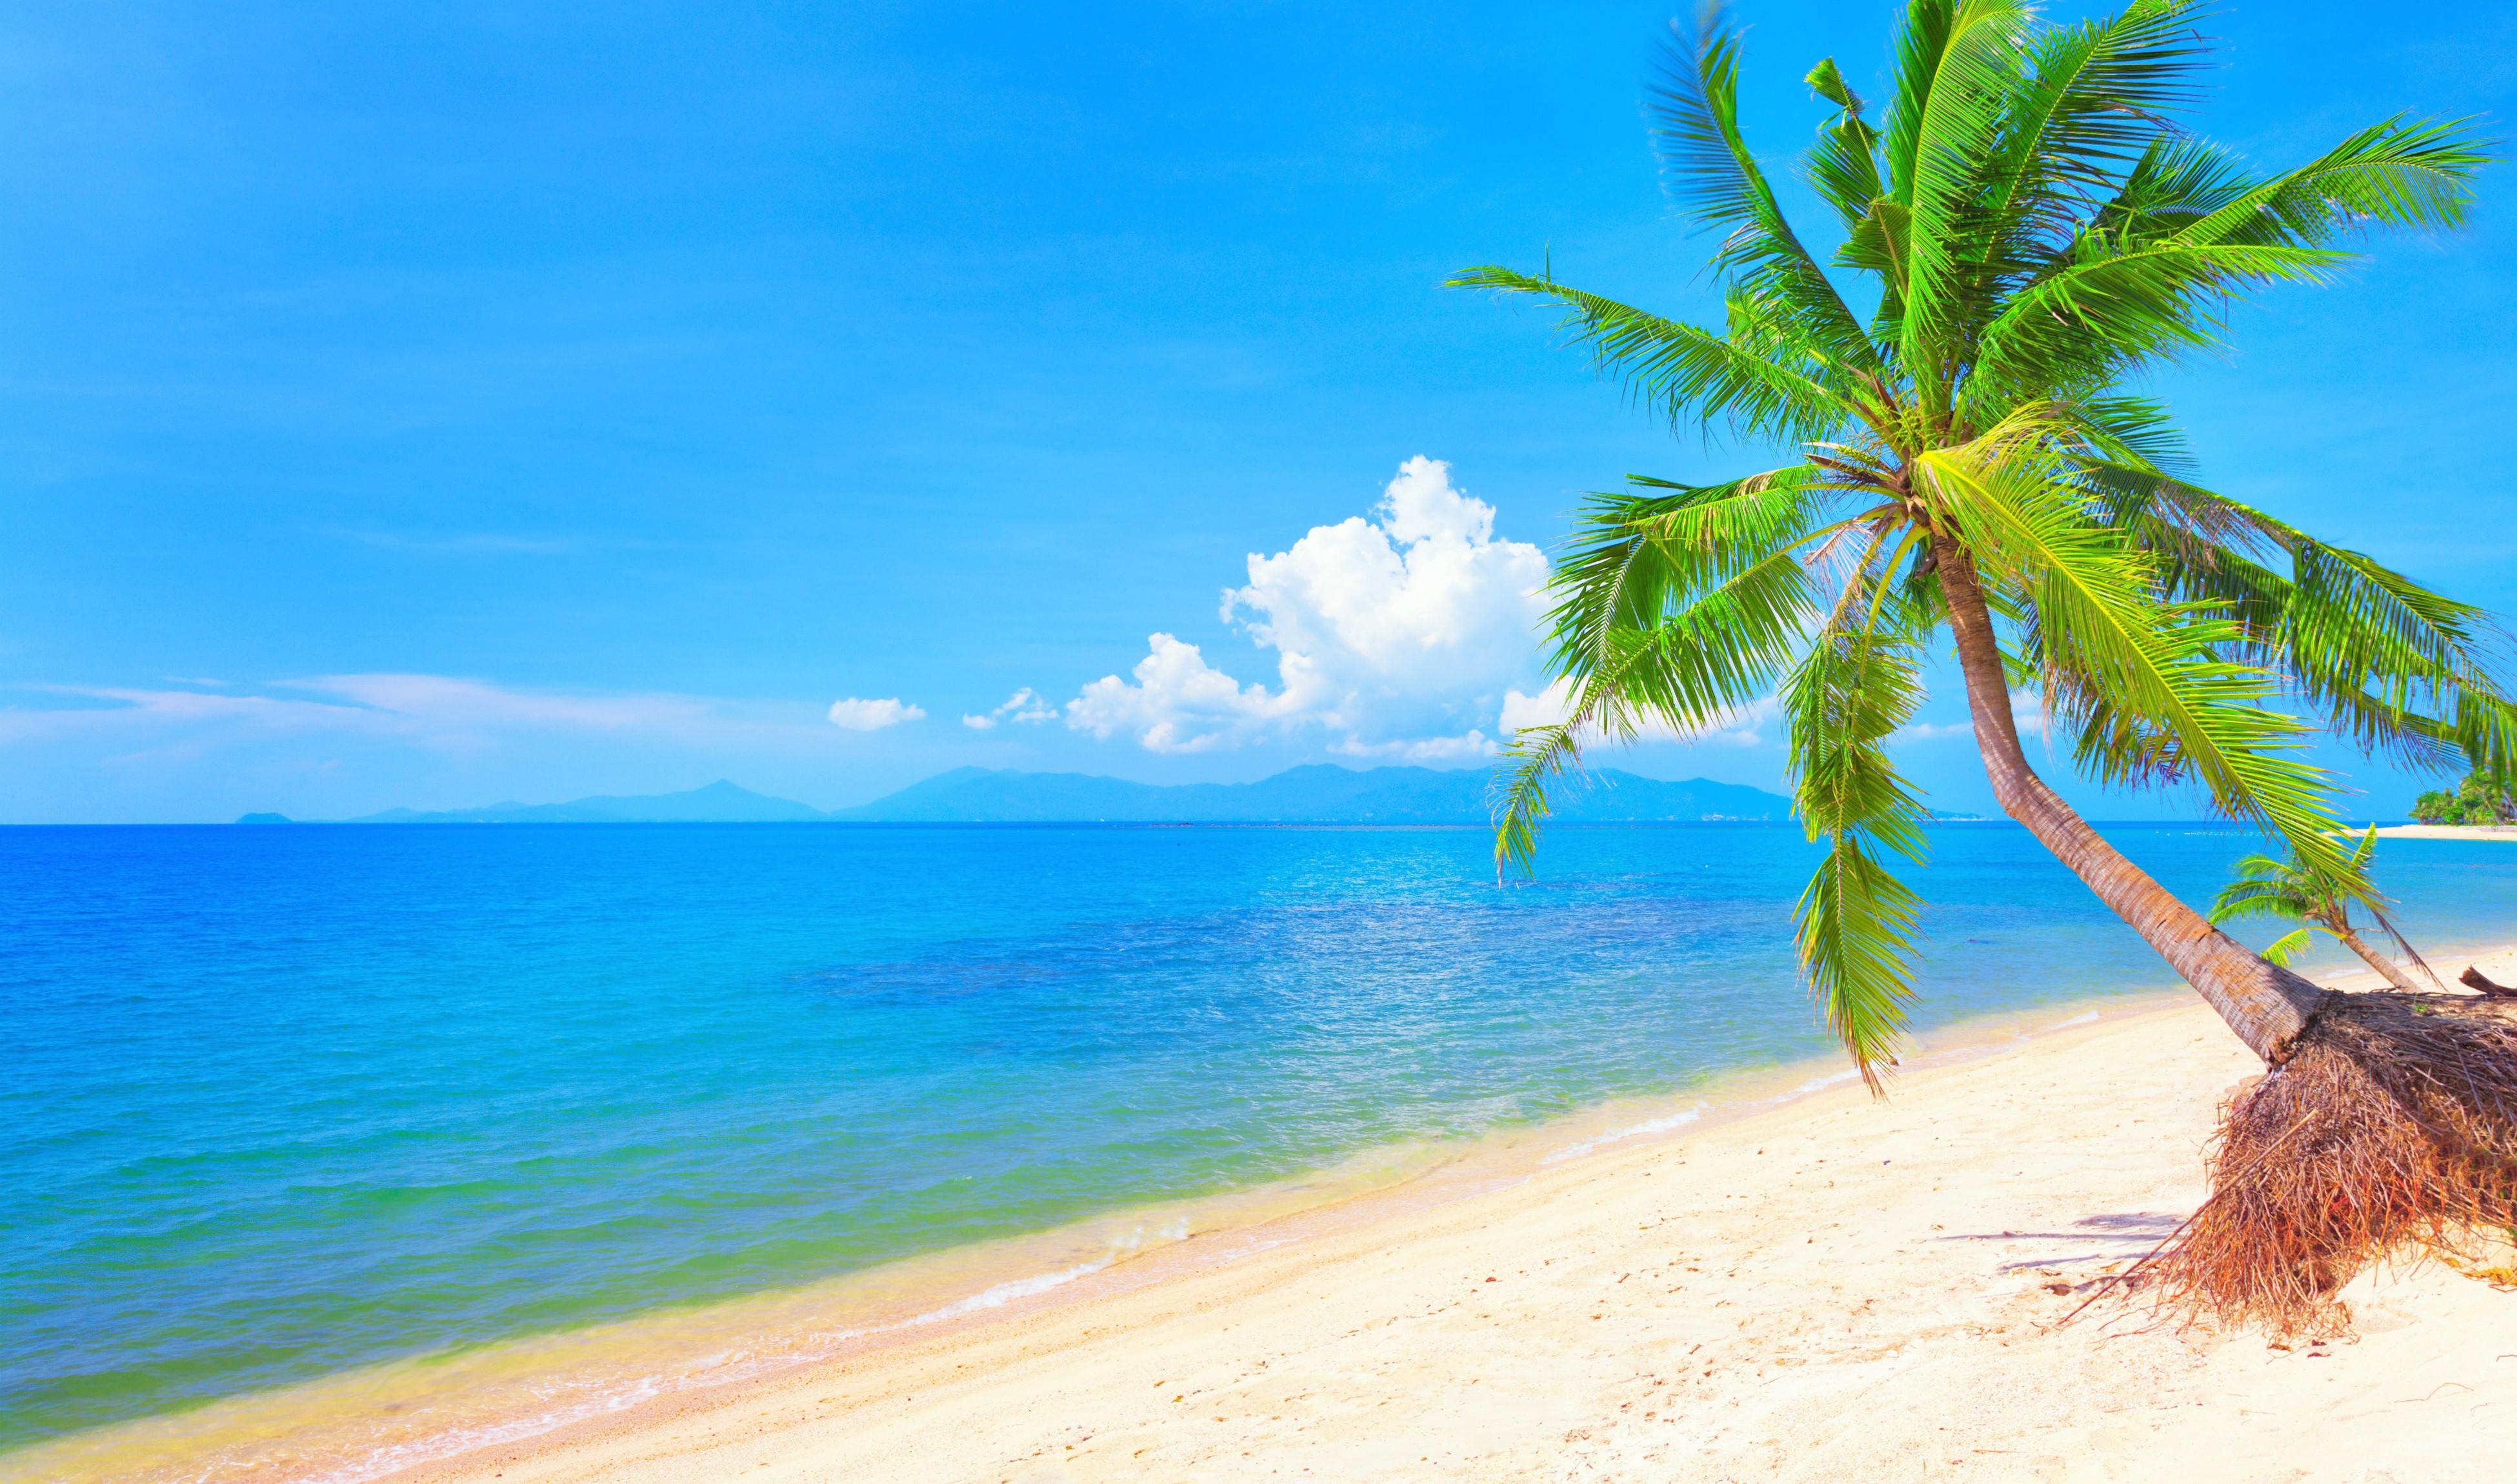 Shore Palms Tropical Beach 4k Hd Desktop Wallpaper For 4k: Tropical Beach 4k Ultra HD Wallpaper